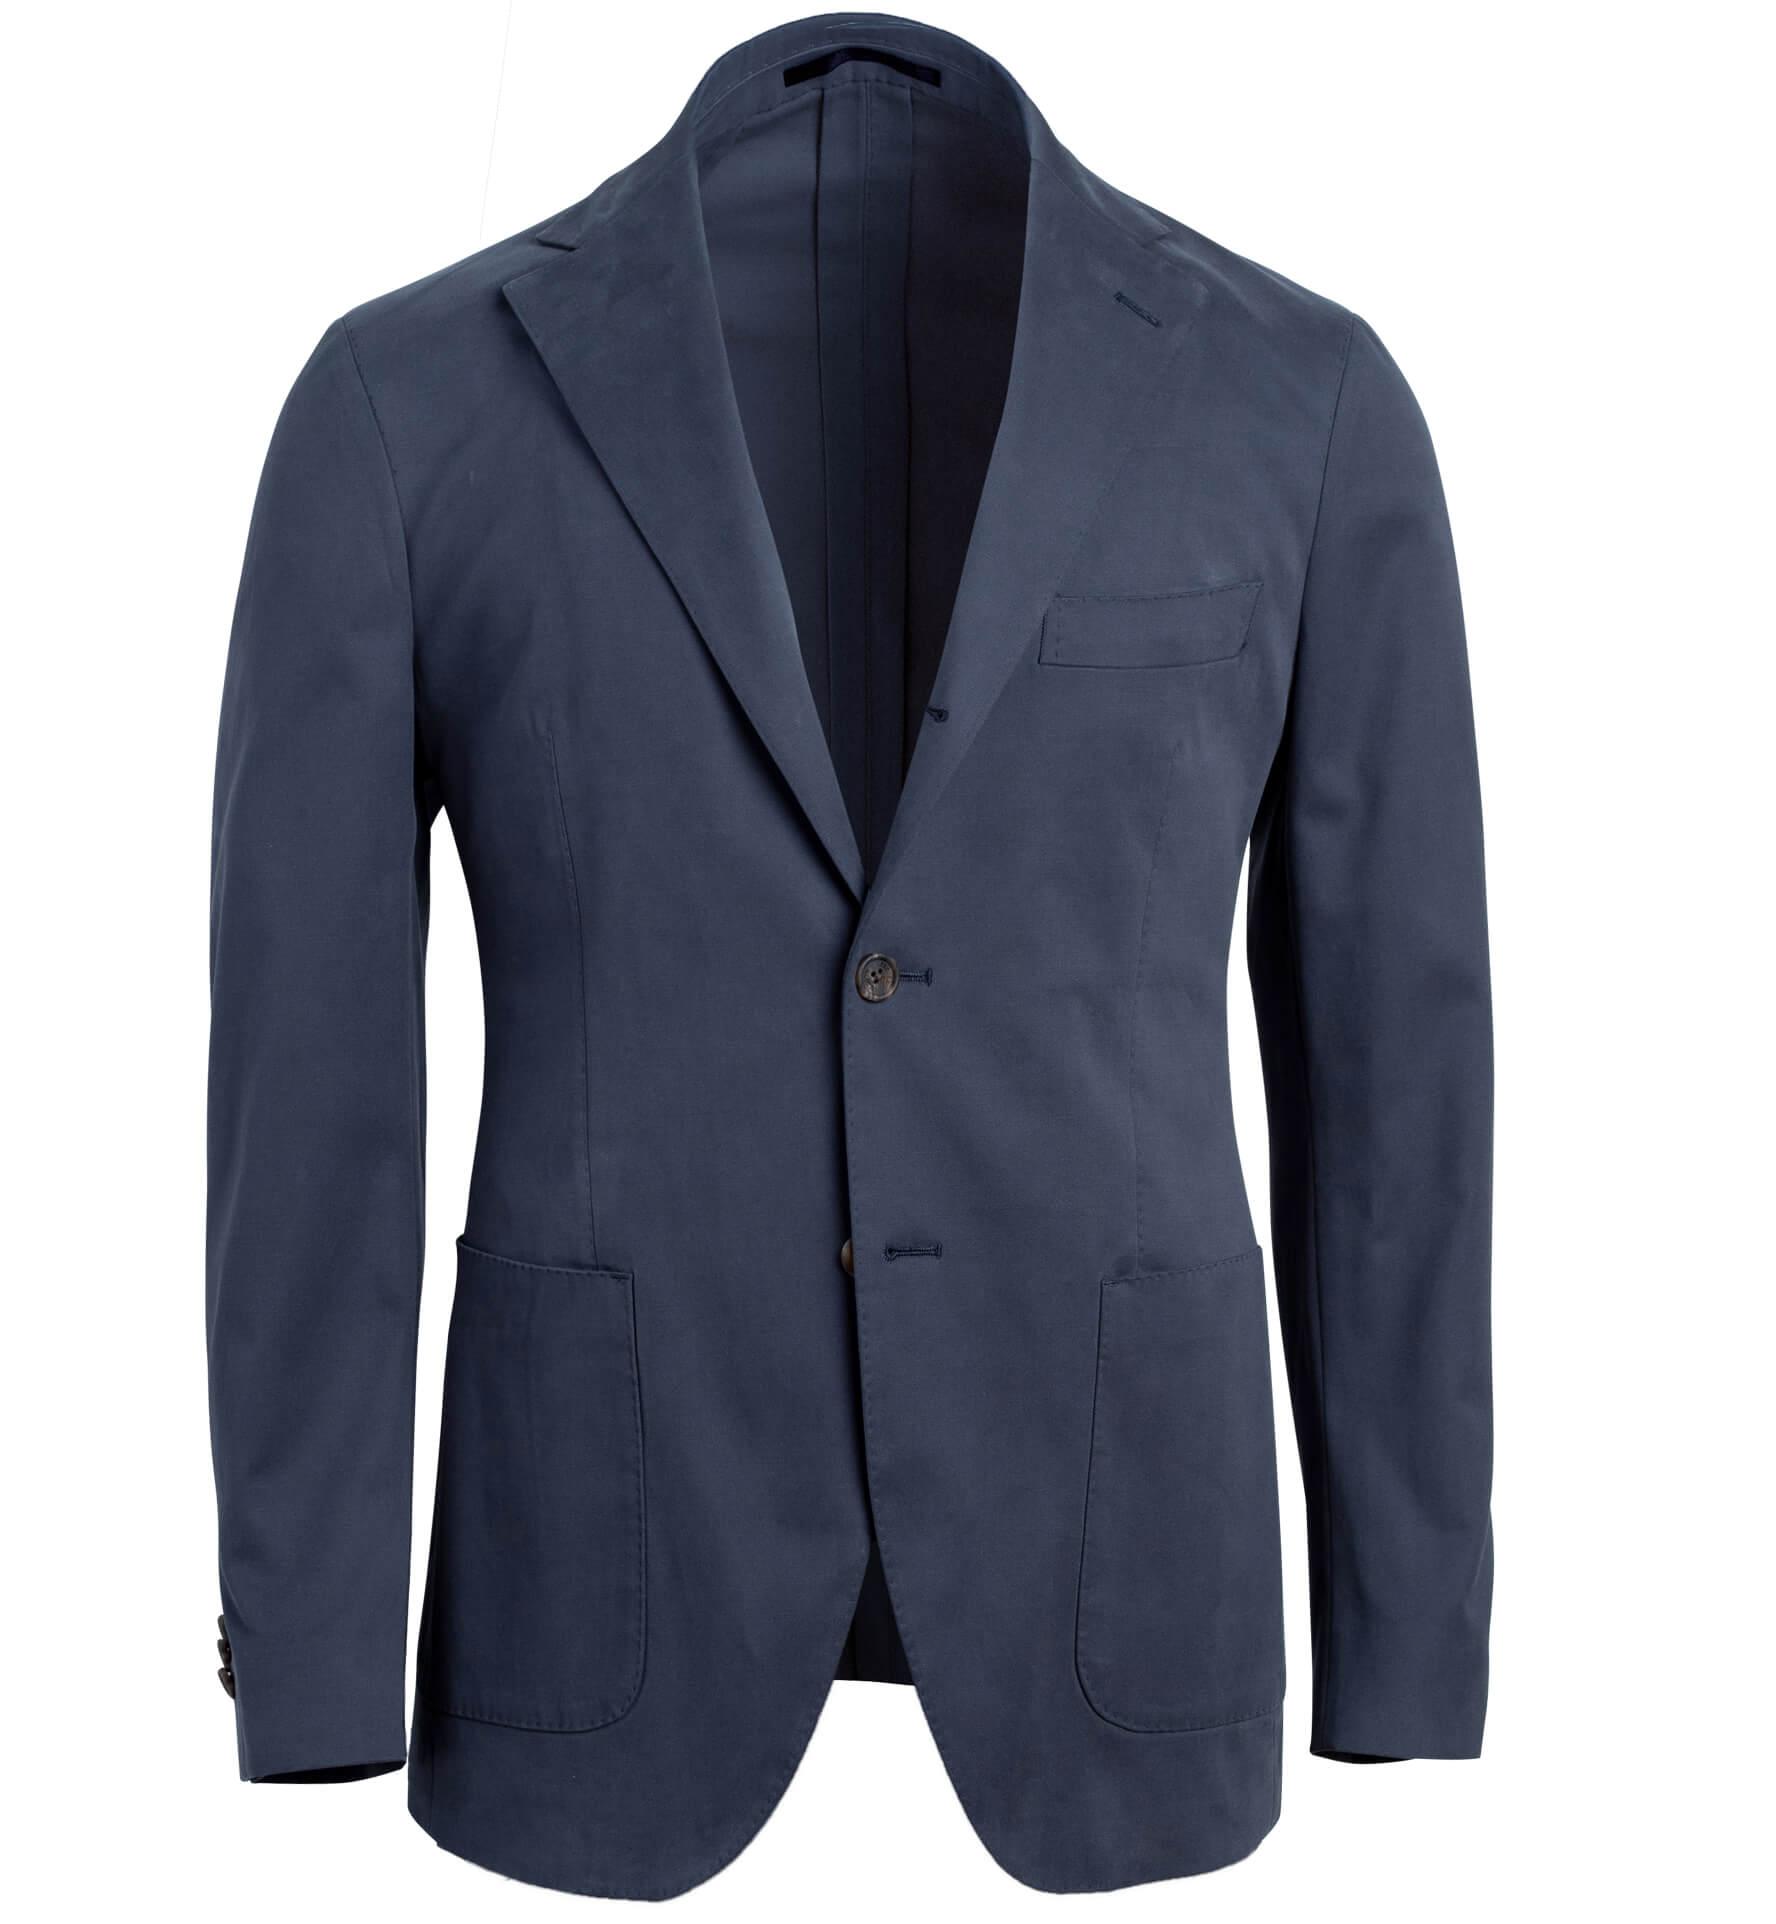 Zoom Image of Waverly Navy Stretch Cotton Jacket